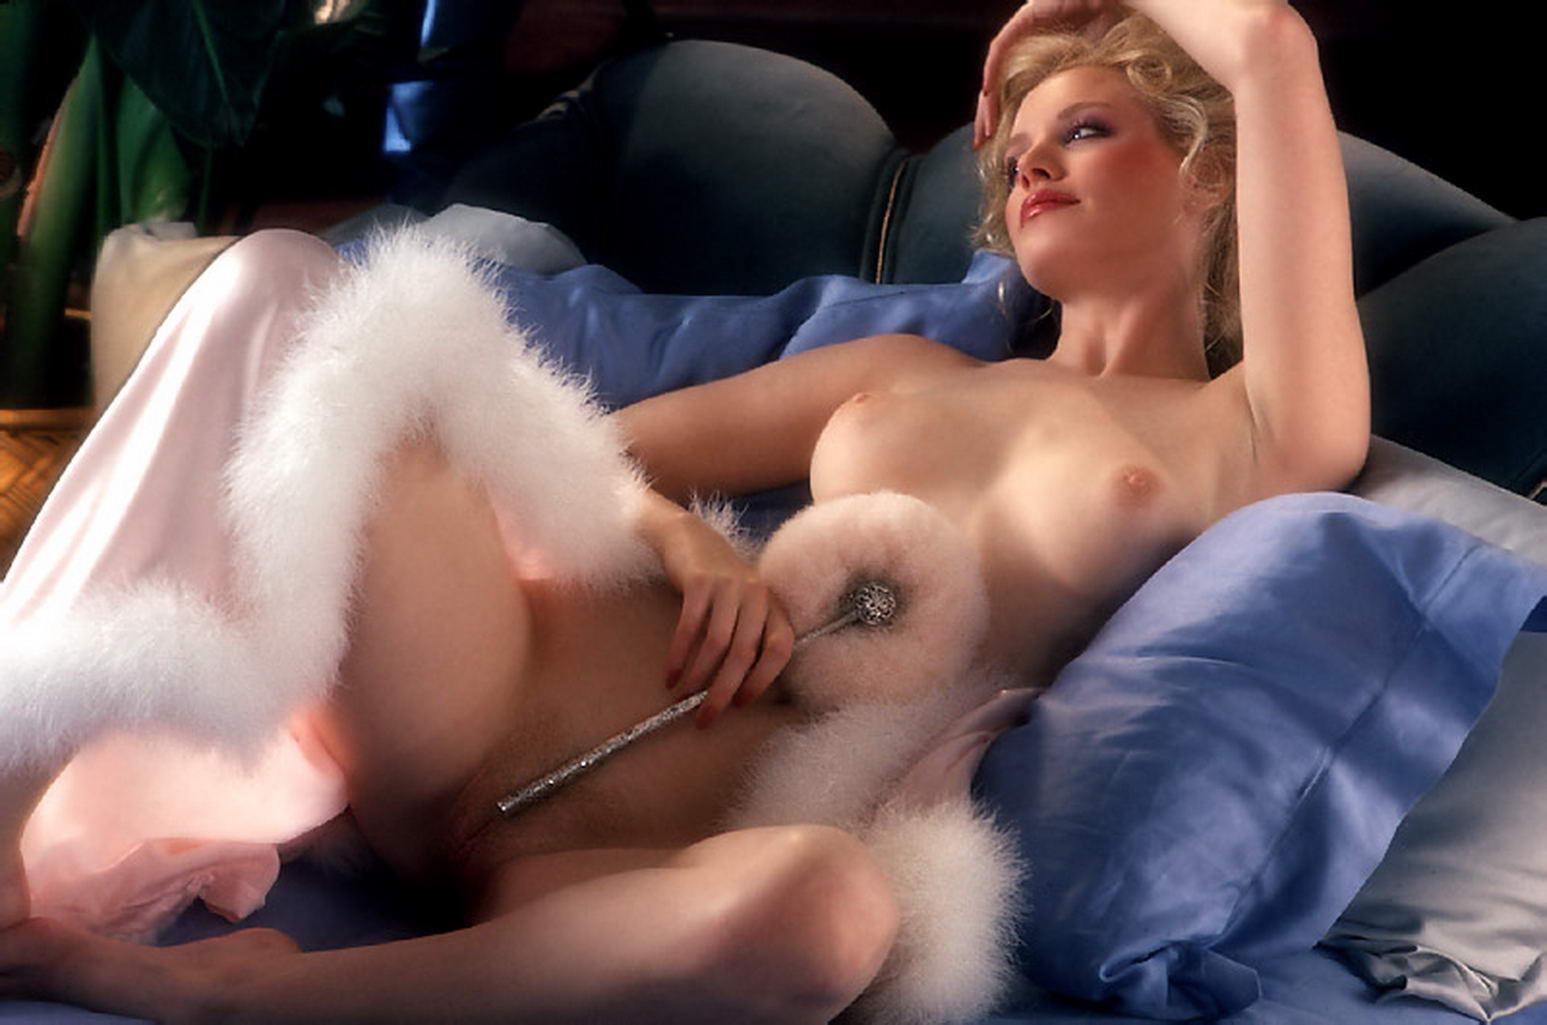 shannon-tweed-nude-vids-smith-hustler